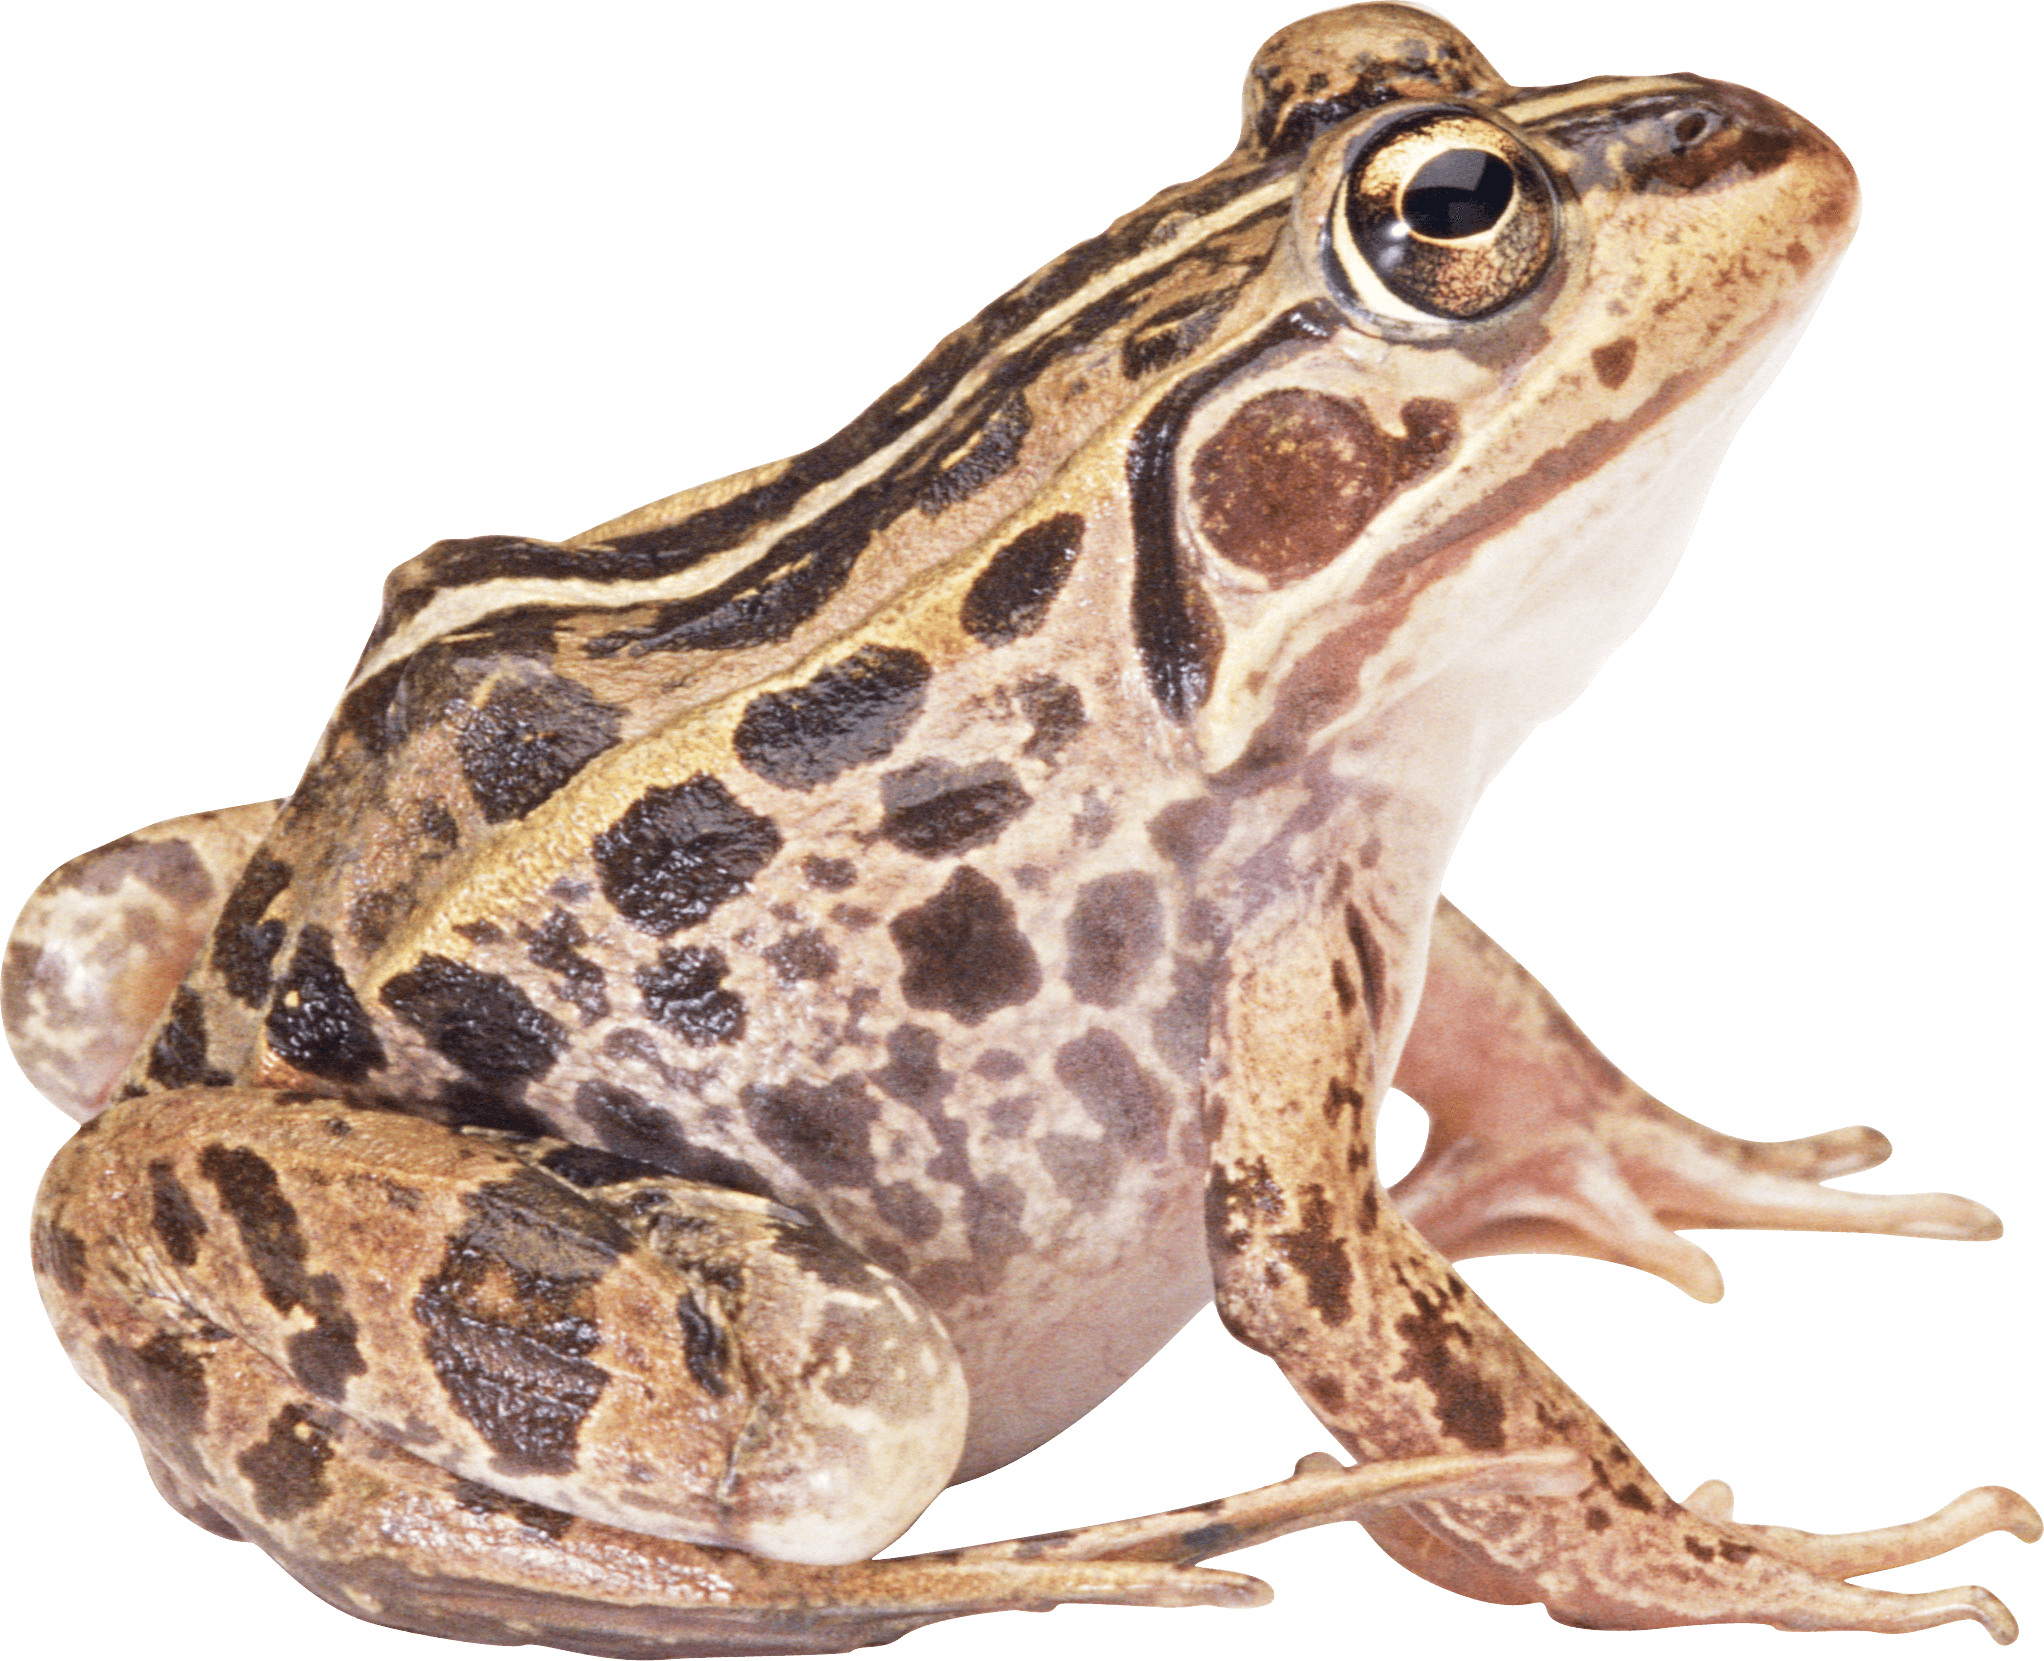 Frog Png Image PNG Image - Frog PNG HD